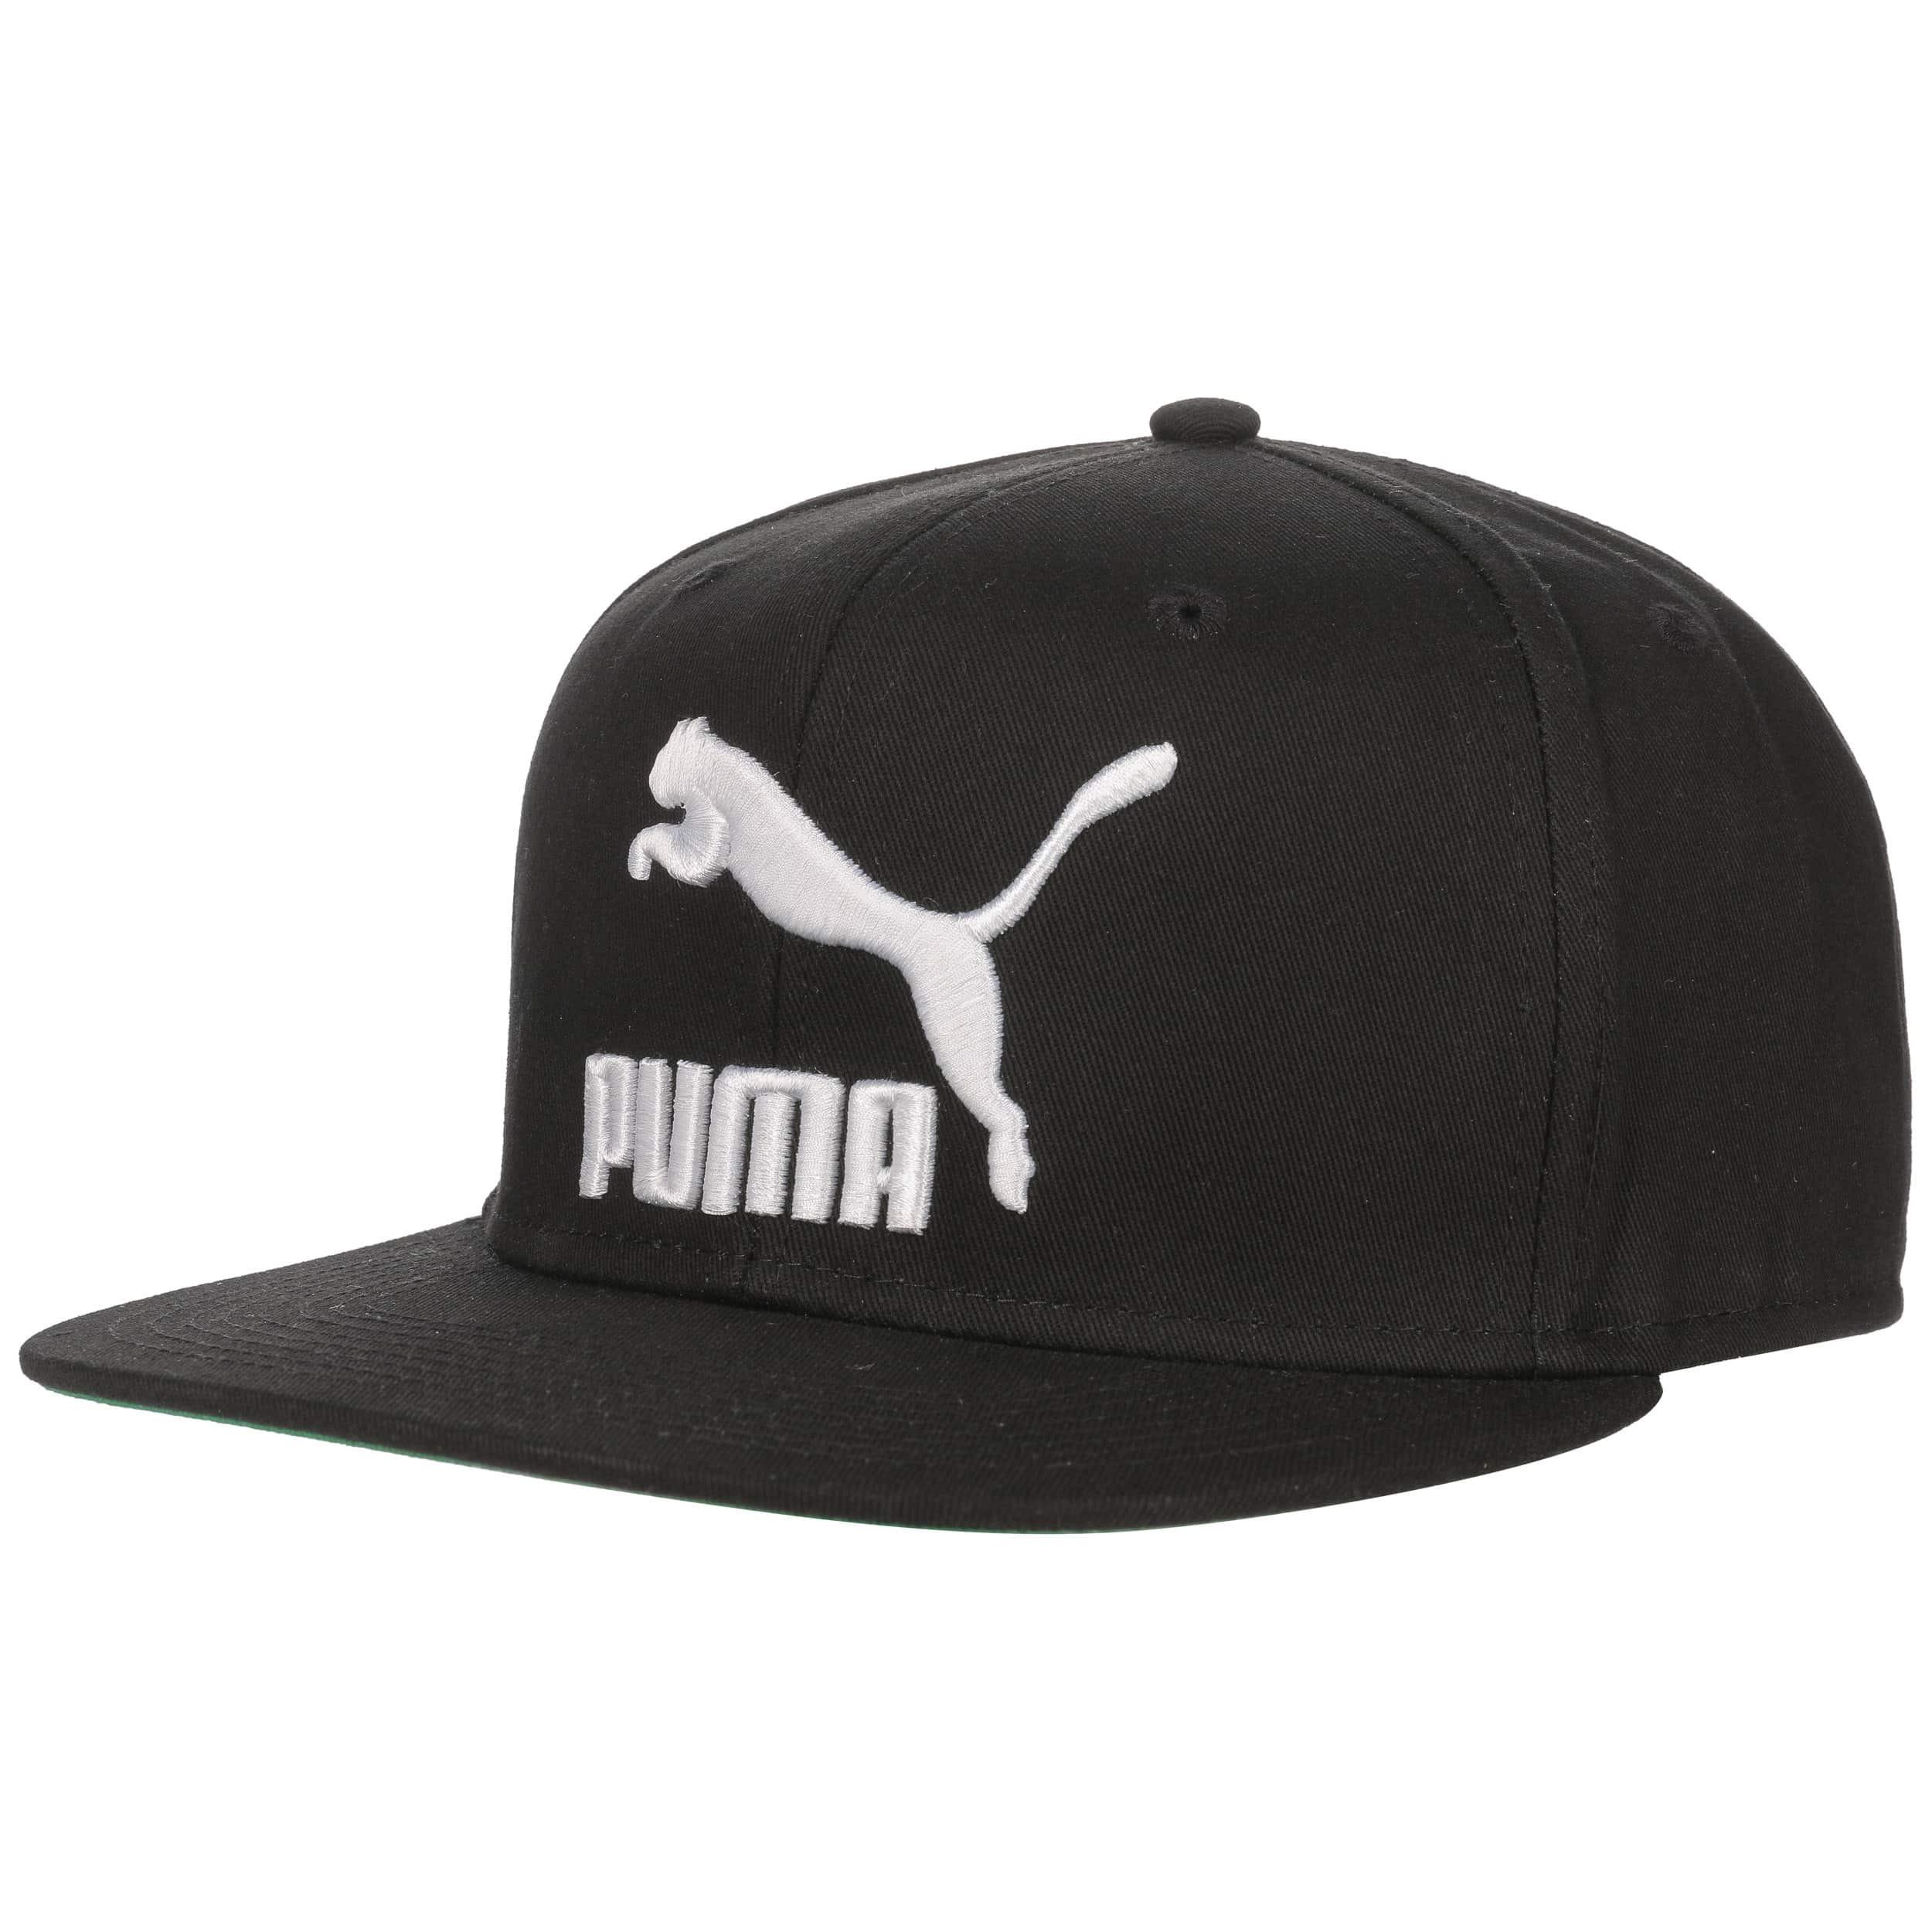 casquette puma noir